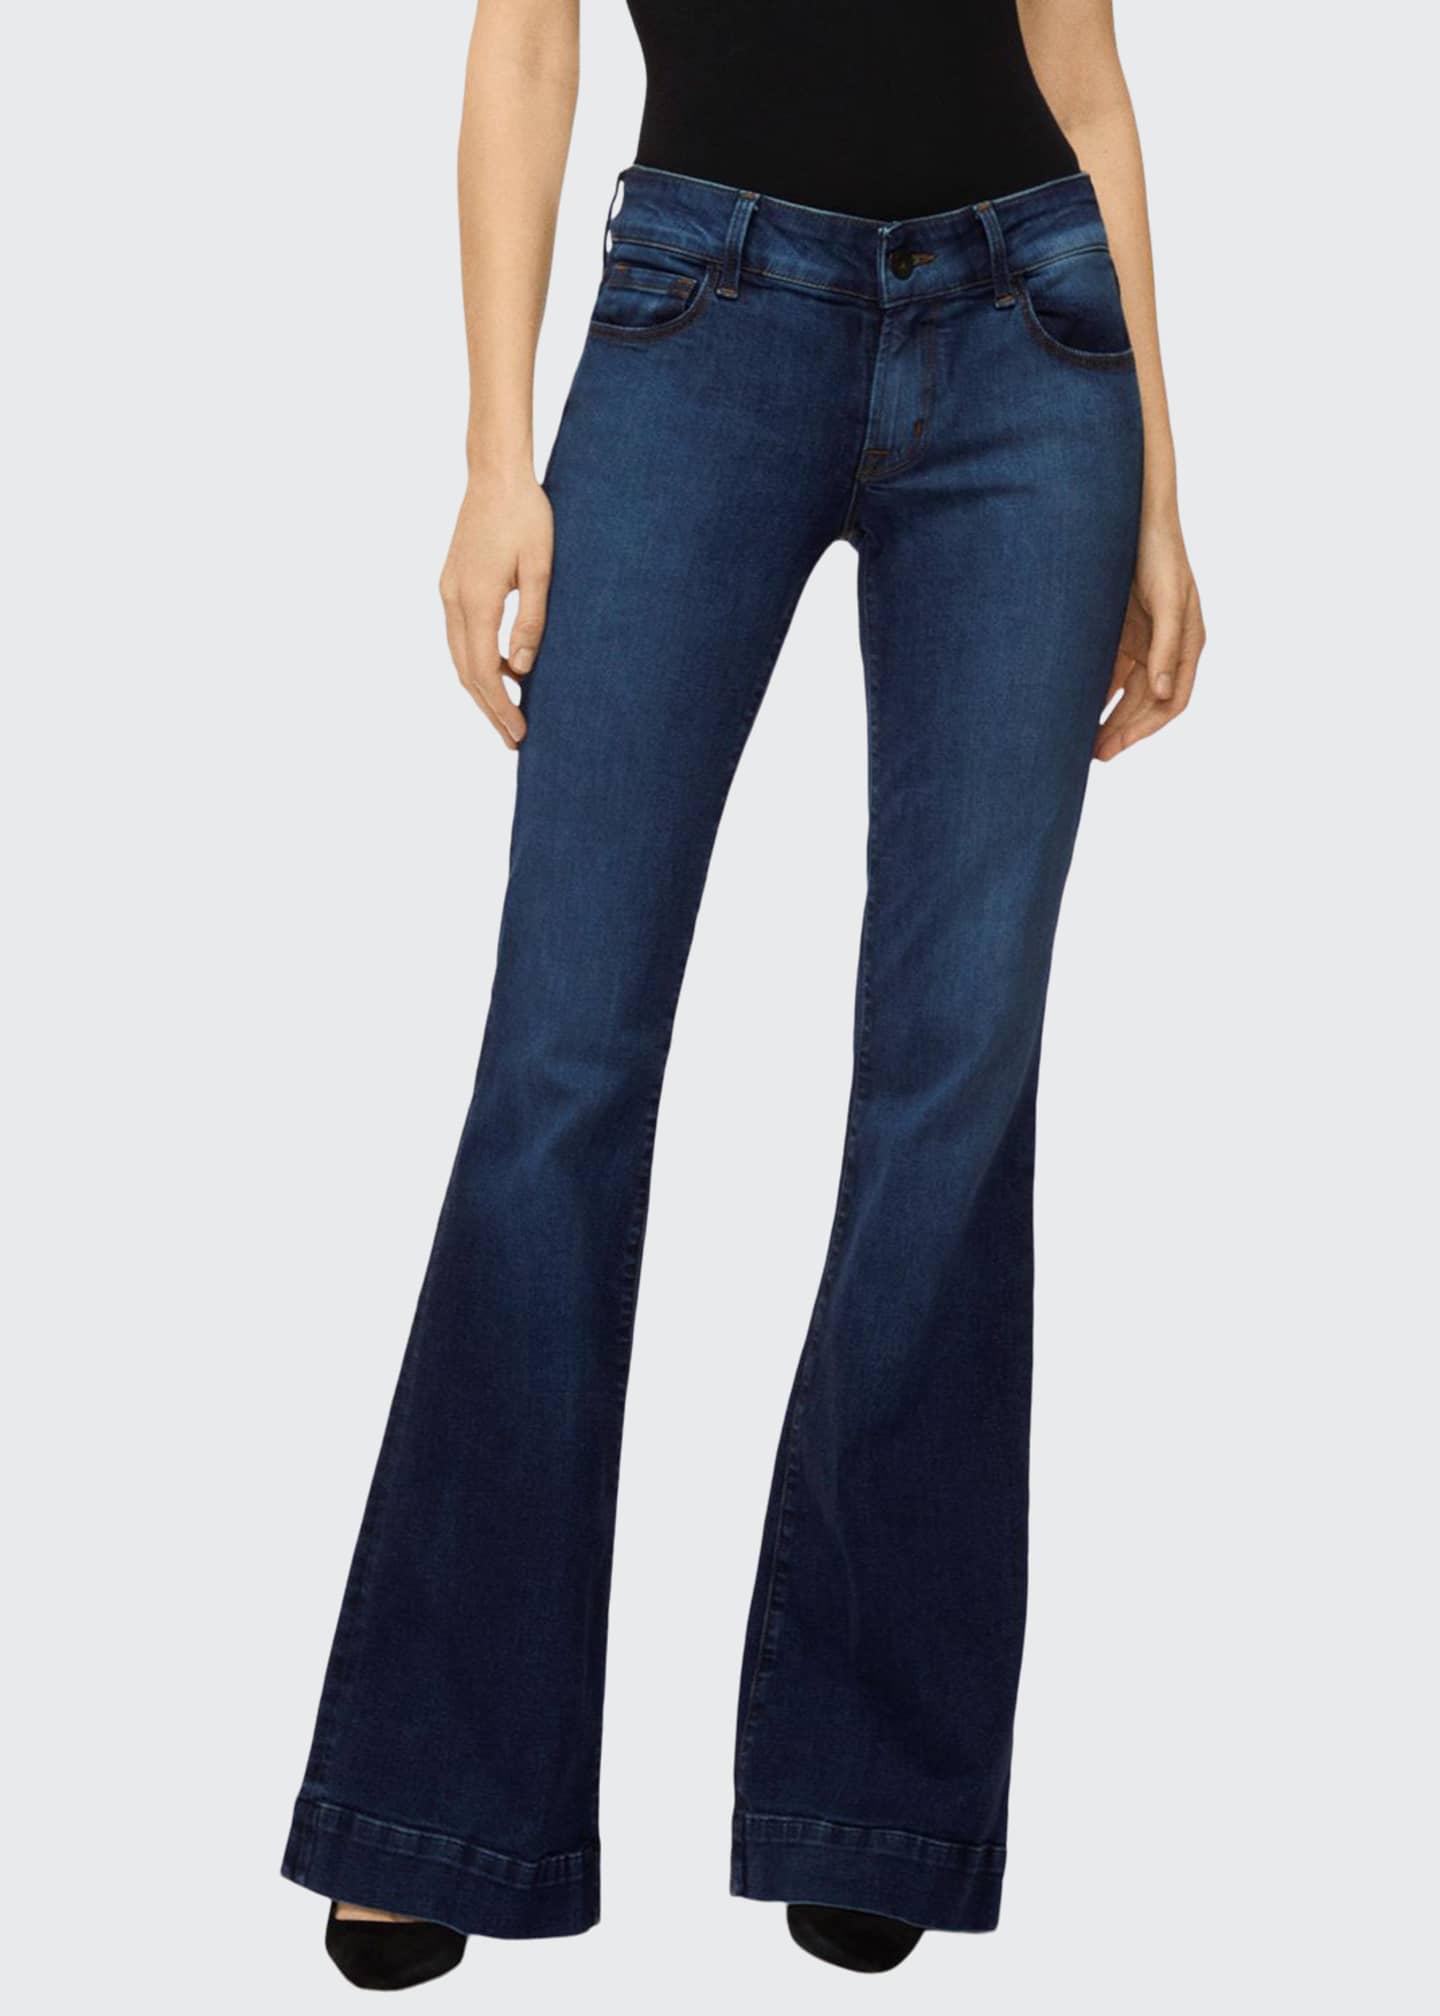 J Brand Loverstory Mid-Rise Flare-Leg Jeans